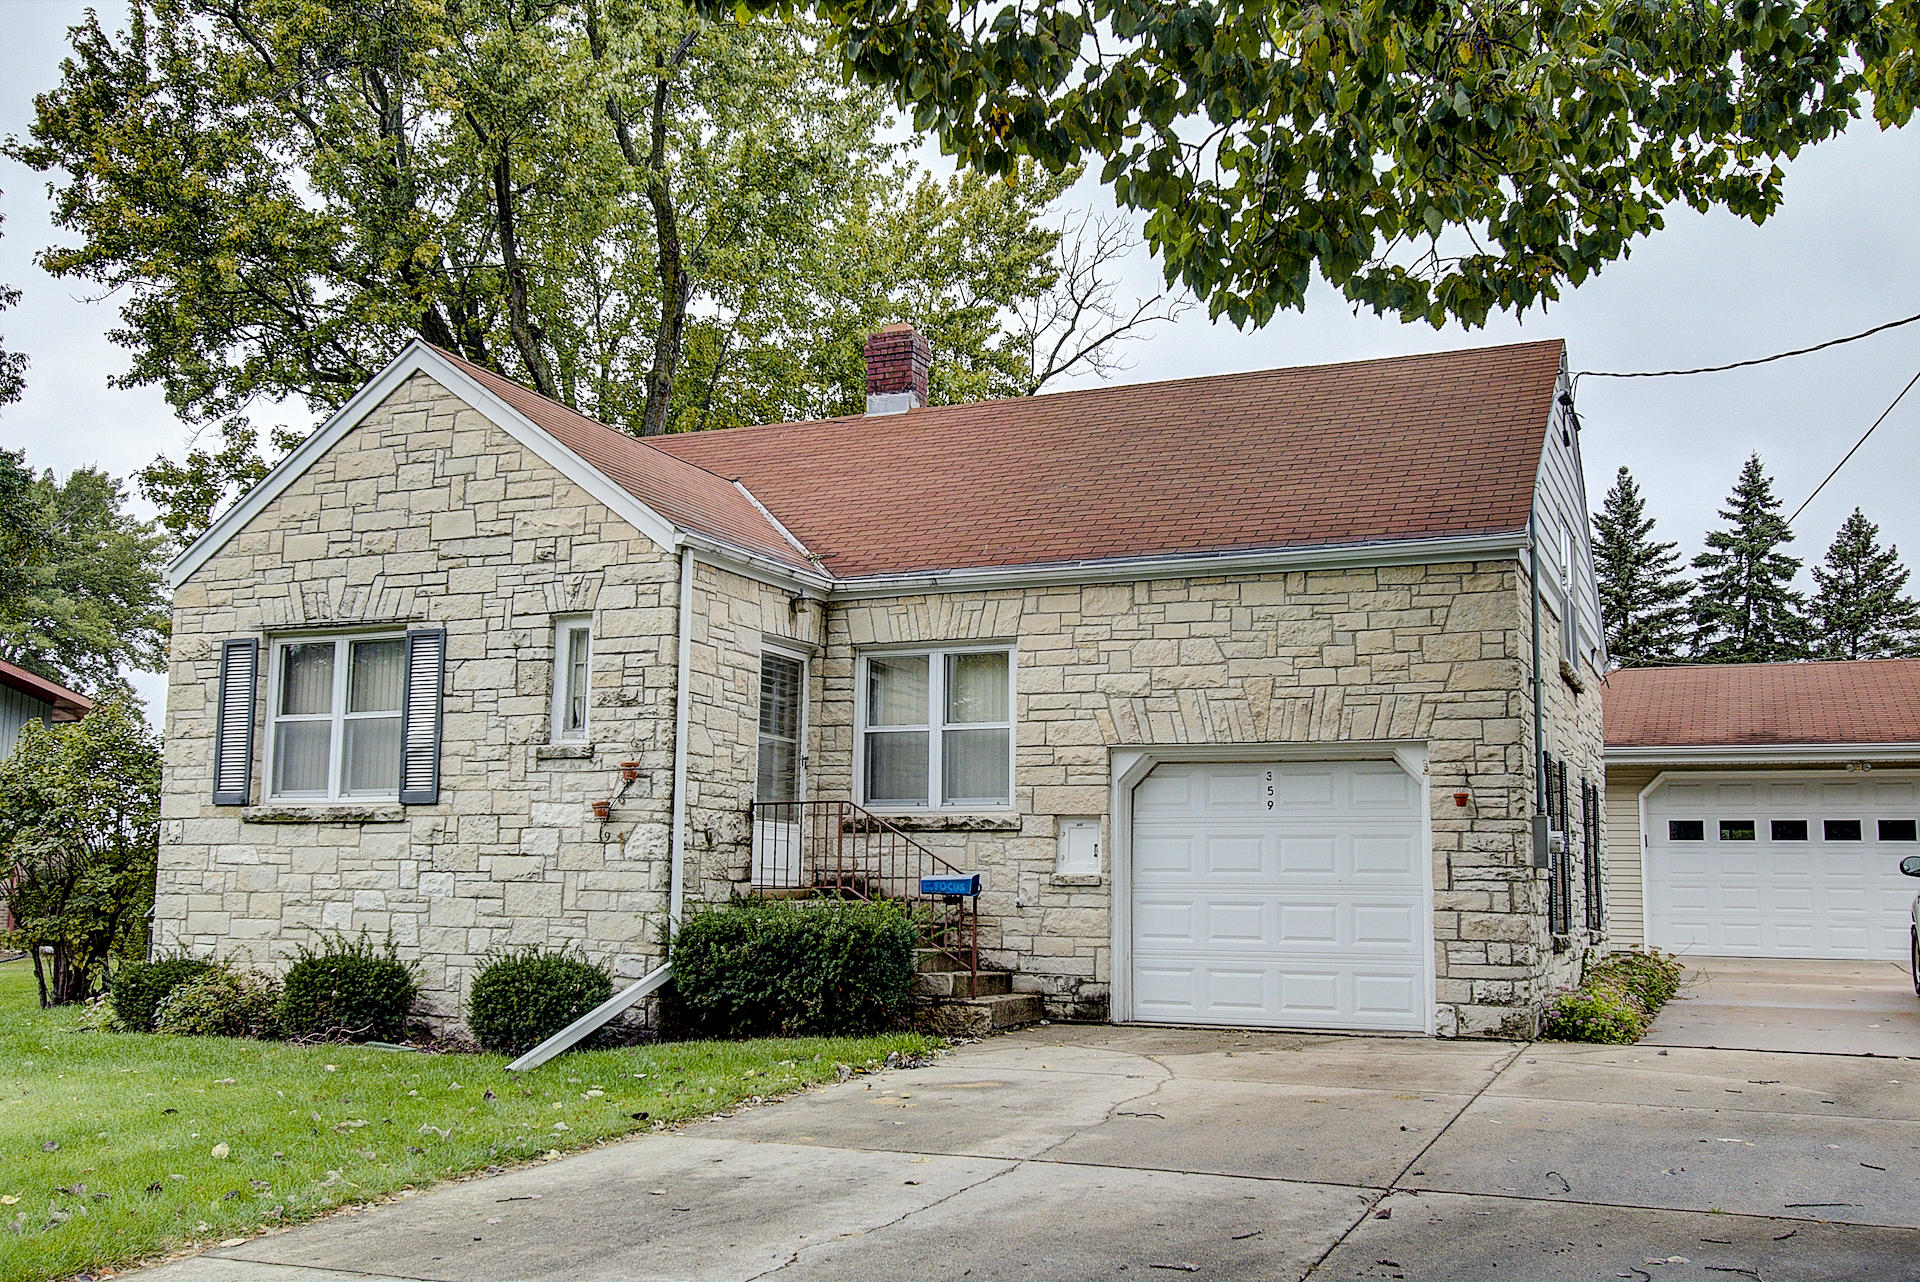 359 Evergreen Ln, Pewaukee, Wisconsin 53072, 2 Bedrooms Bedrooms, 5 Rooms Rooms,1 BathroomBathrooms,Single-Family,For Sale,Evergreen Ln,1609359